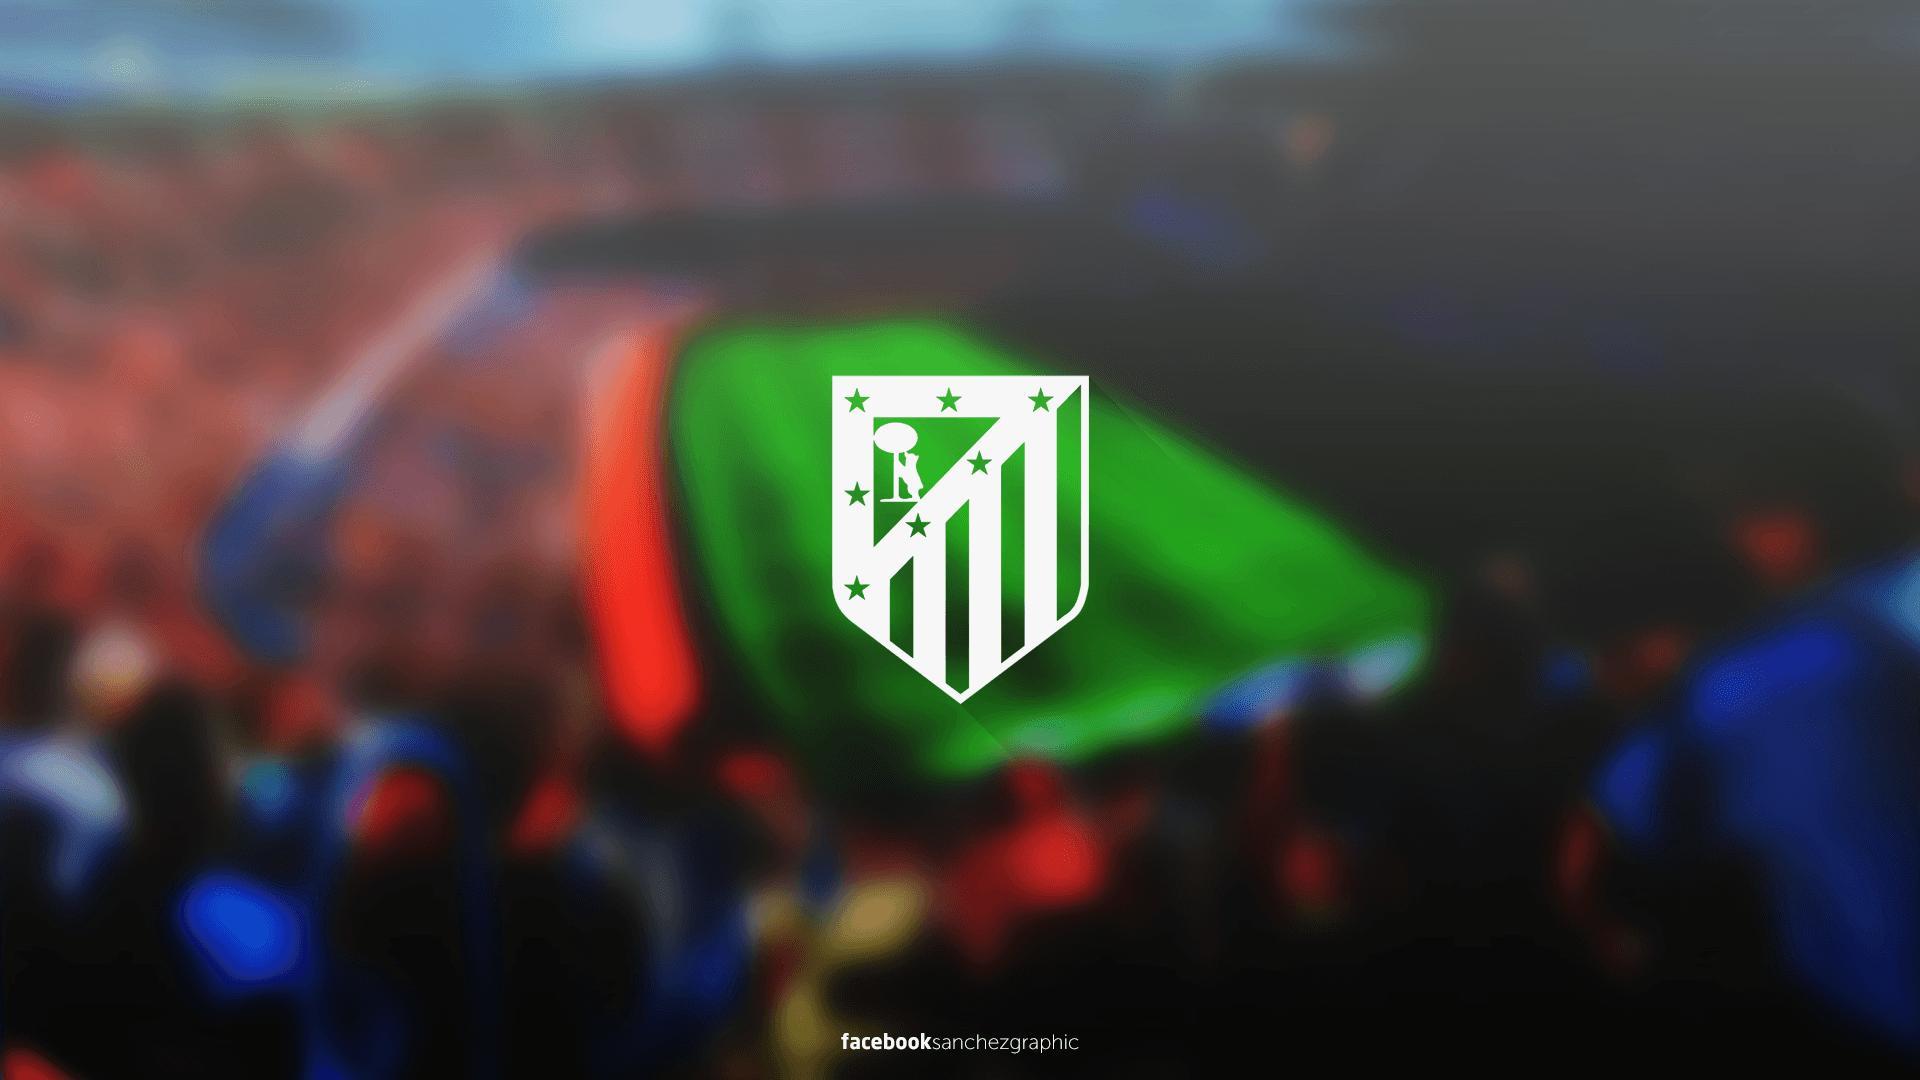 Atletico Madrid Wallpapers Hd Free Download - Resim - Sayfa: 10